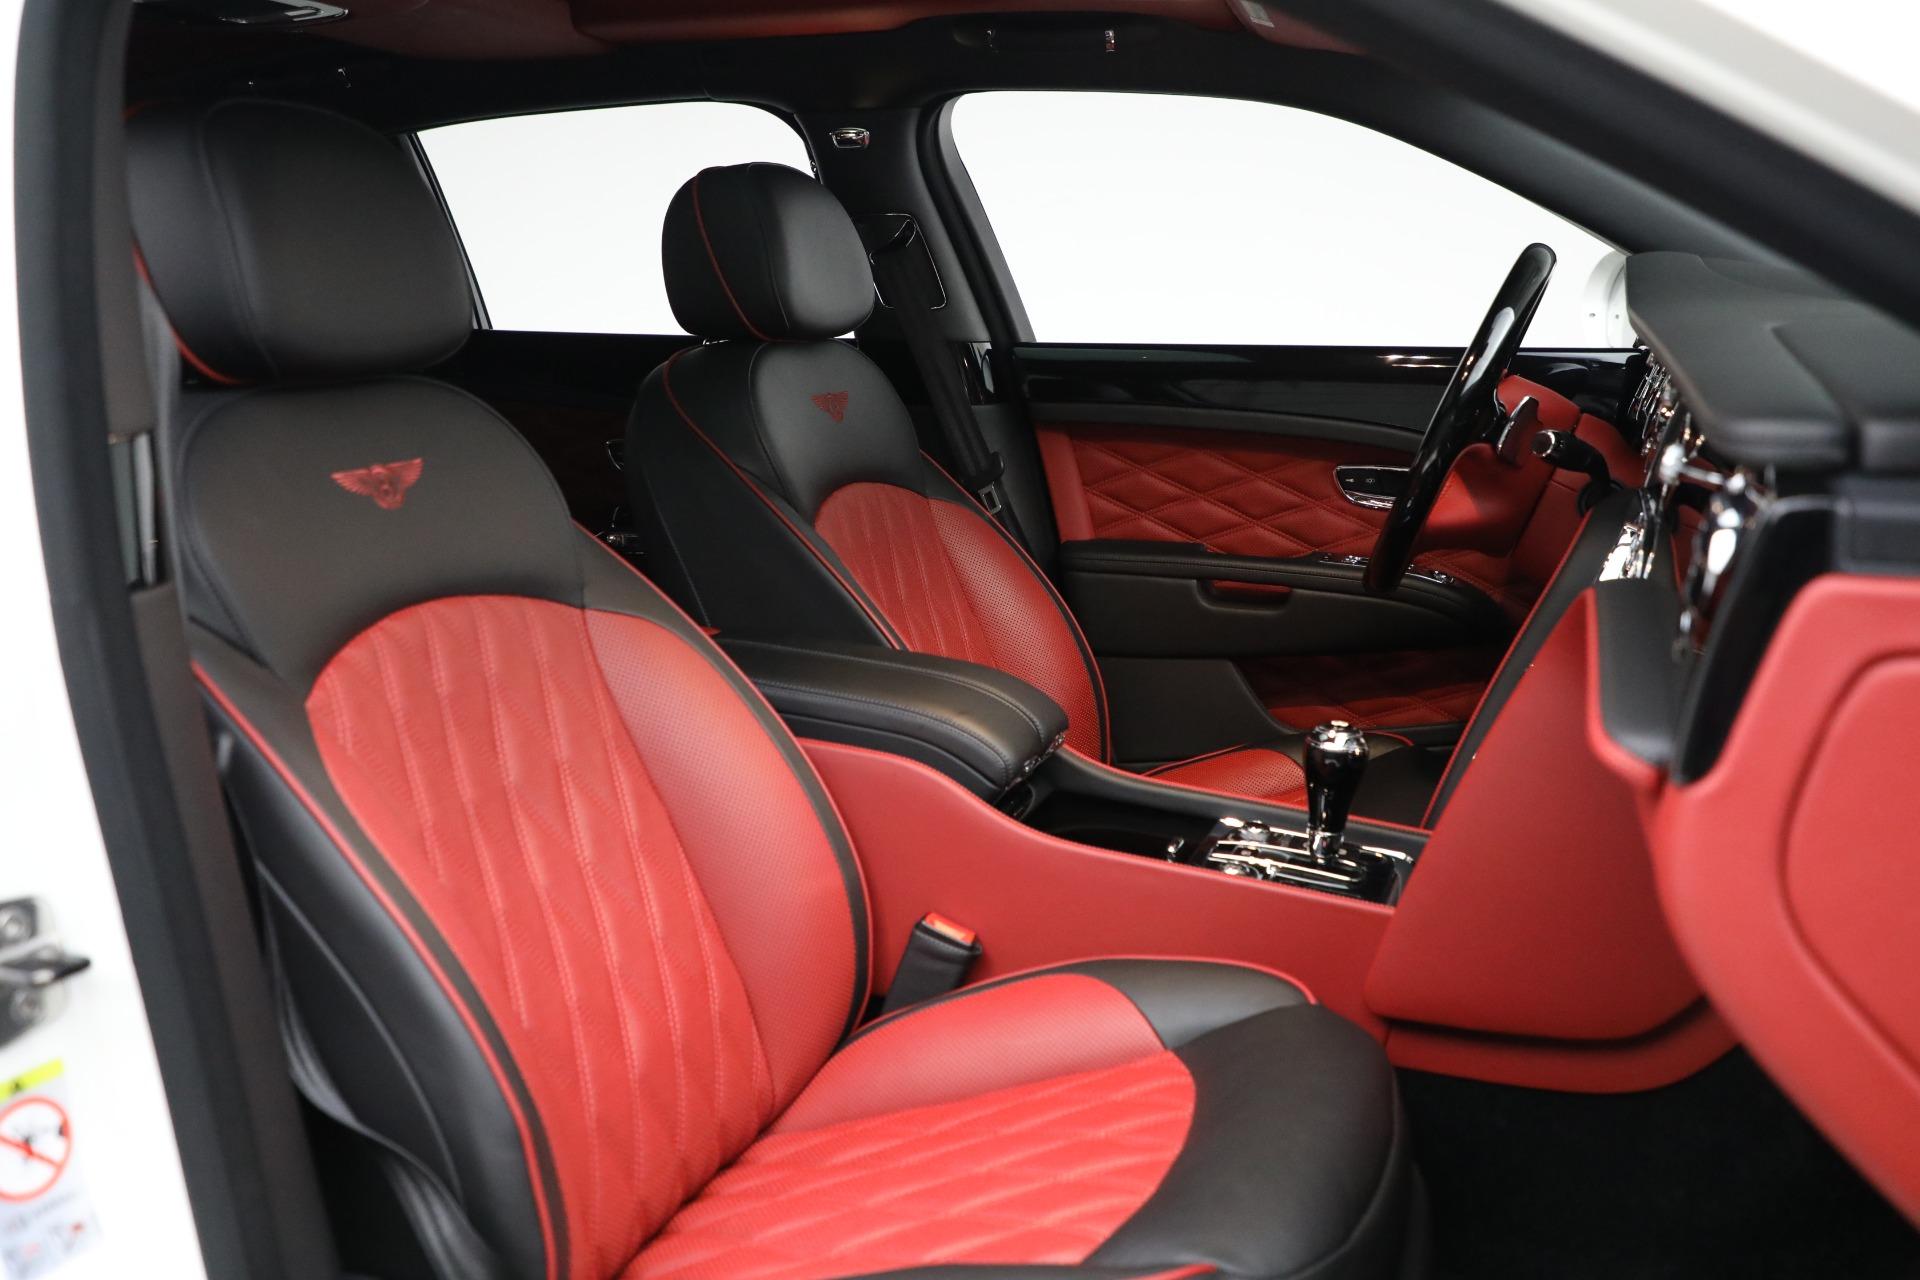 Used 2018 Bentley Mulsanne Speed For Sale In Westport, CT 2075_p29